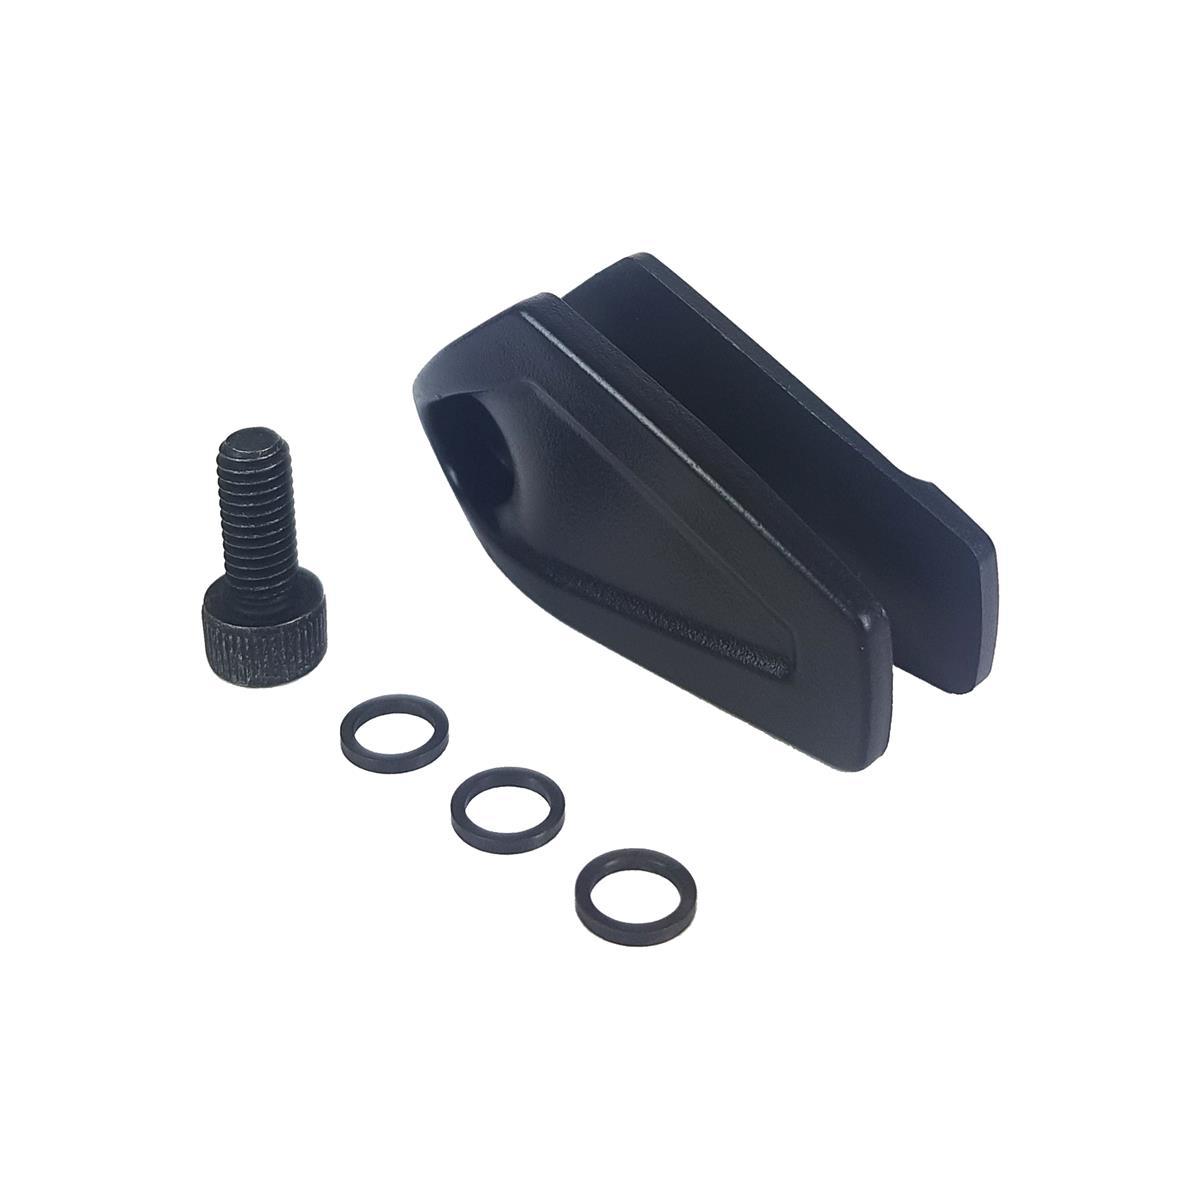 Guidacatena per modelli Bosch Gen4 625wh e Yamaha i600